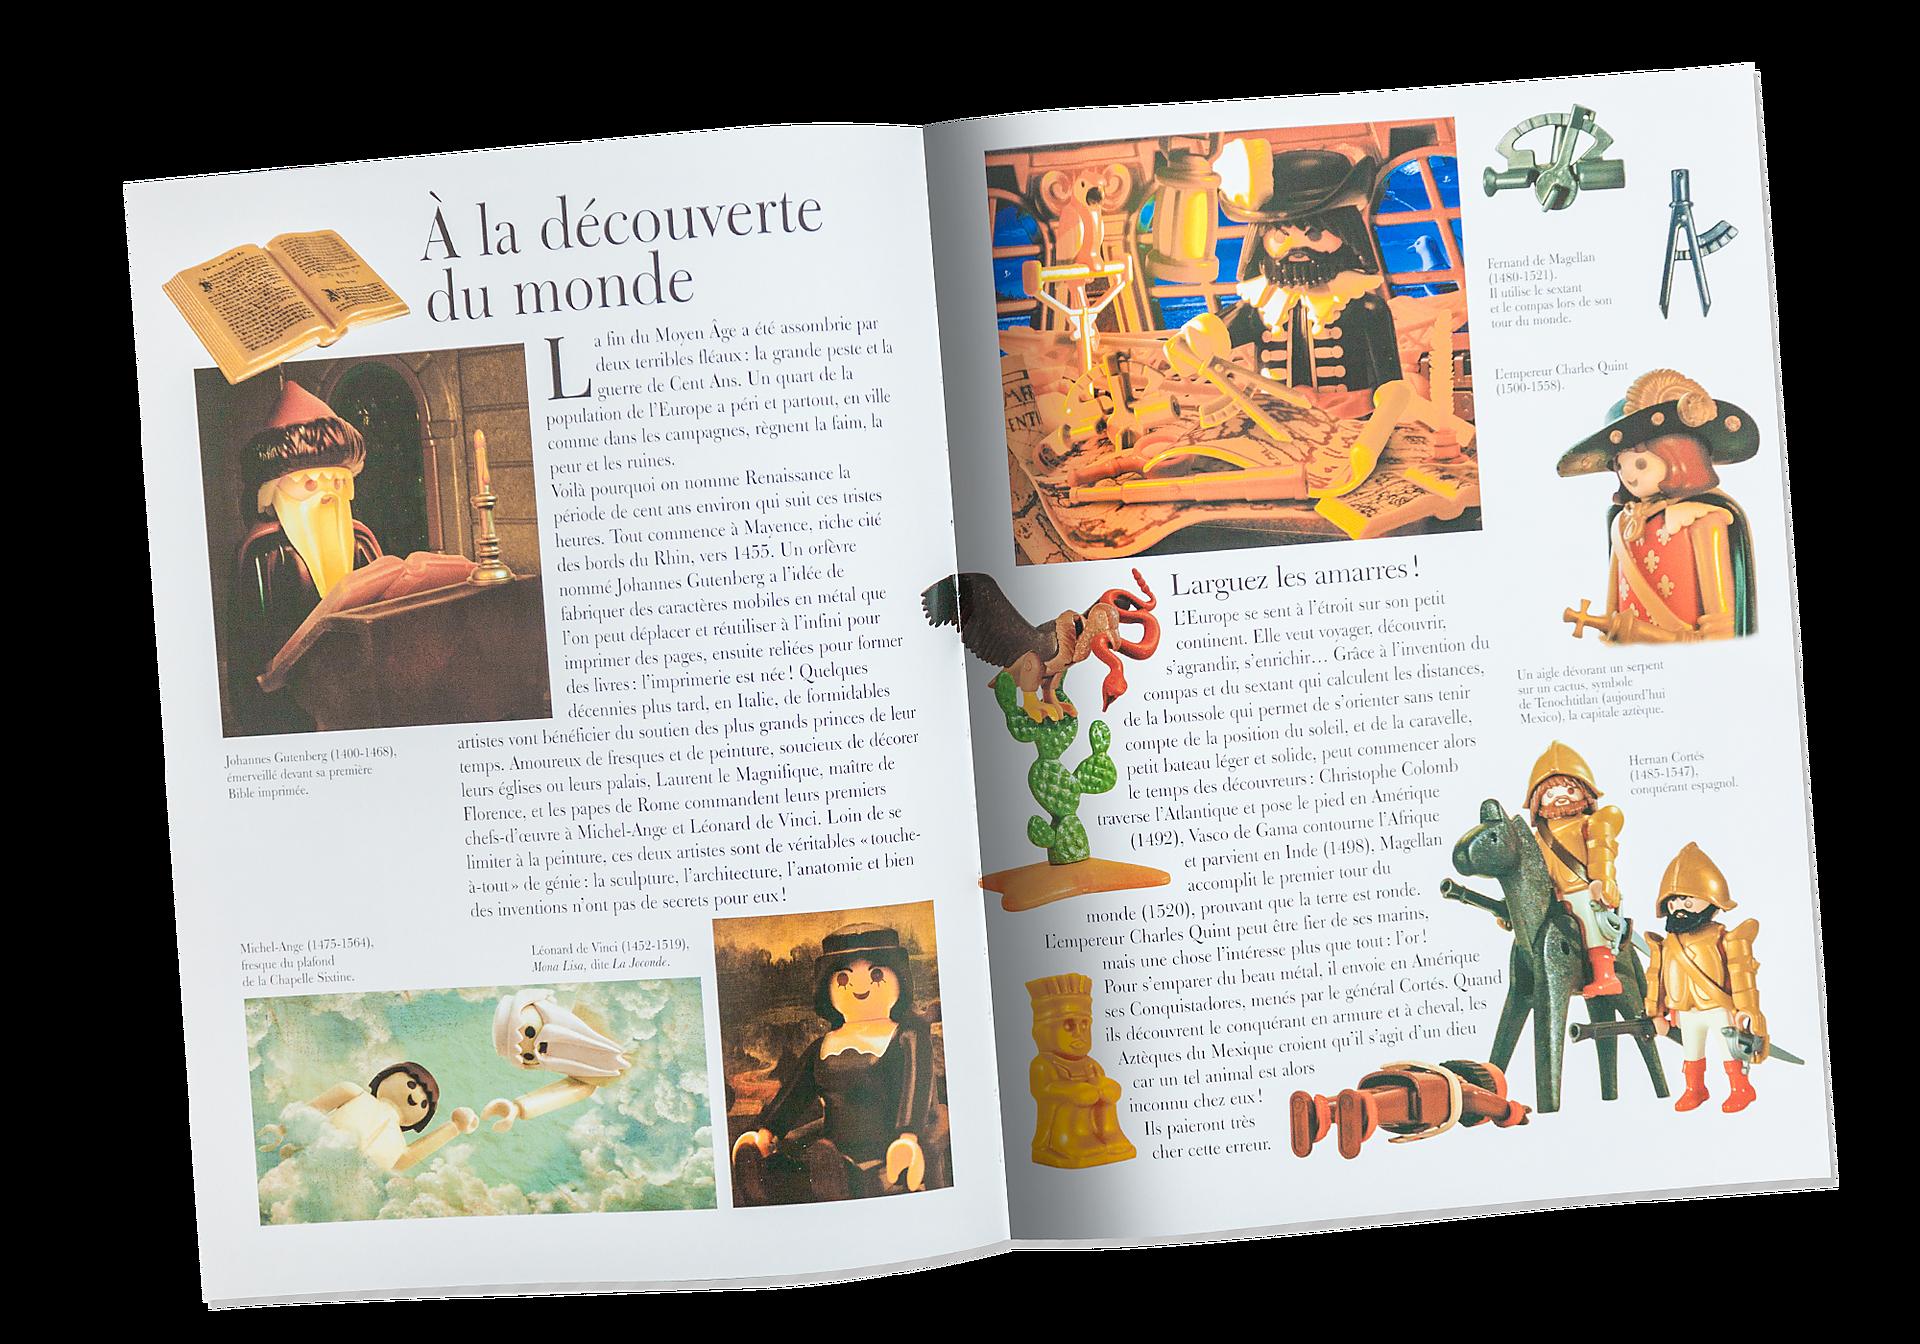 http://media.playmobil.com/i/playmobil/80042_product_extra3/La grande Aventure de I`Histoire avec PLAYMOBIL français